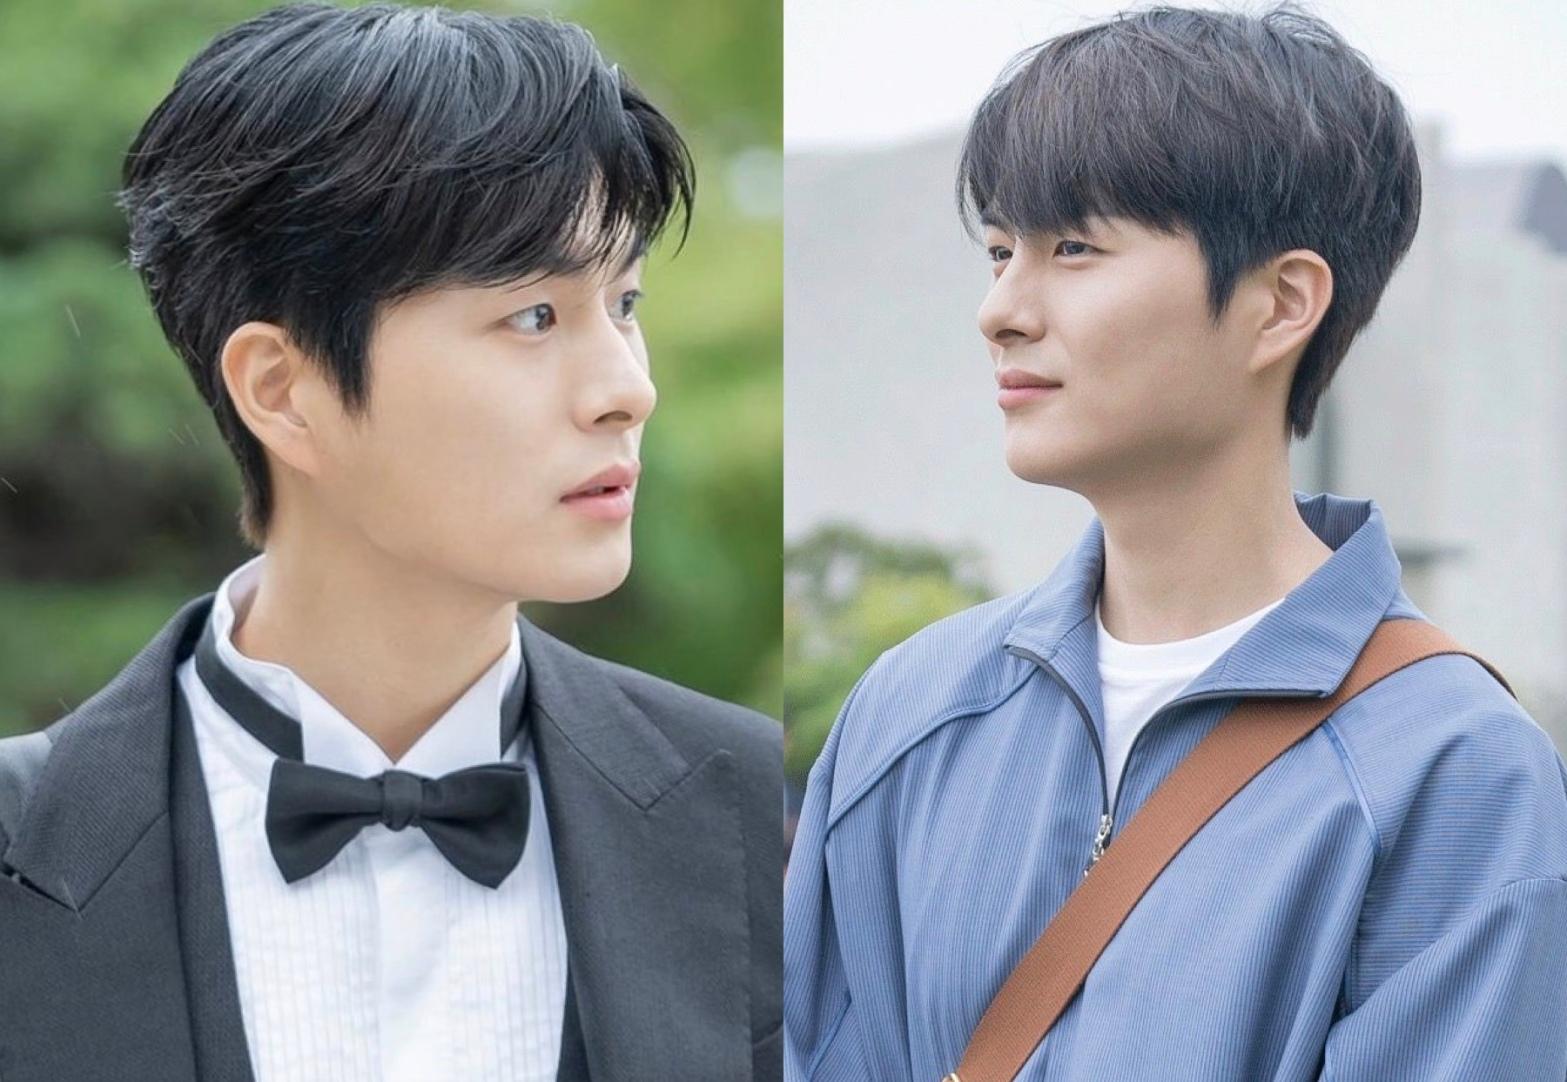 Jung Gun Joo as Lee Dohwa in Extraordinary You